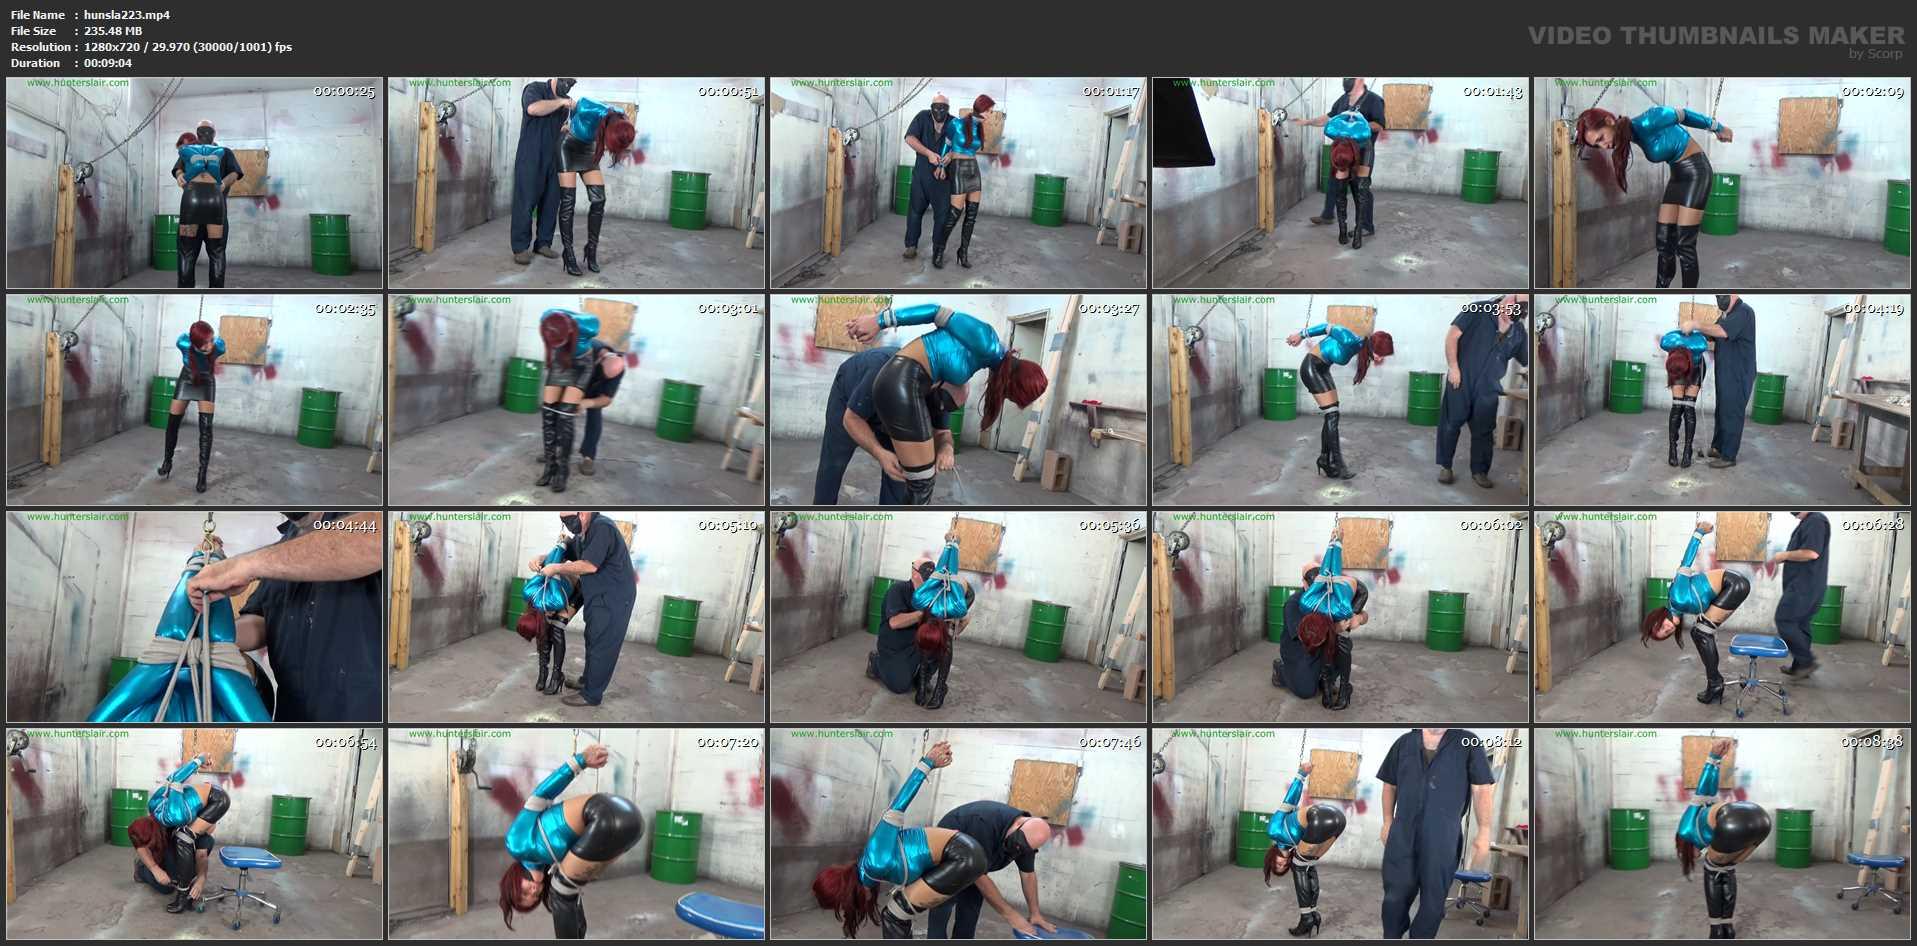 [HUNTERSLAIR] Booted Brazilians brutal strappado. Featuring: Stefania Mafra [HD][720p][MP4]